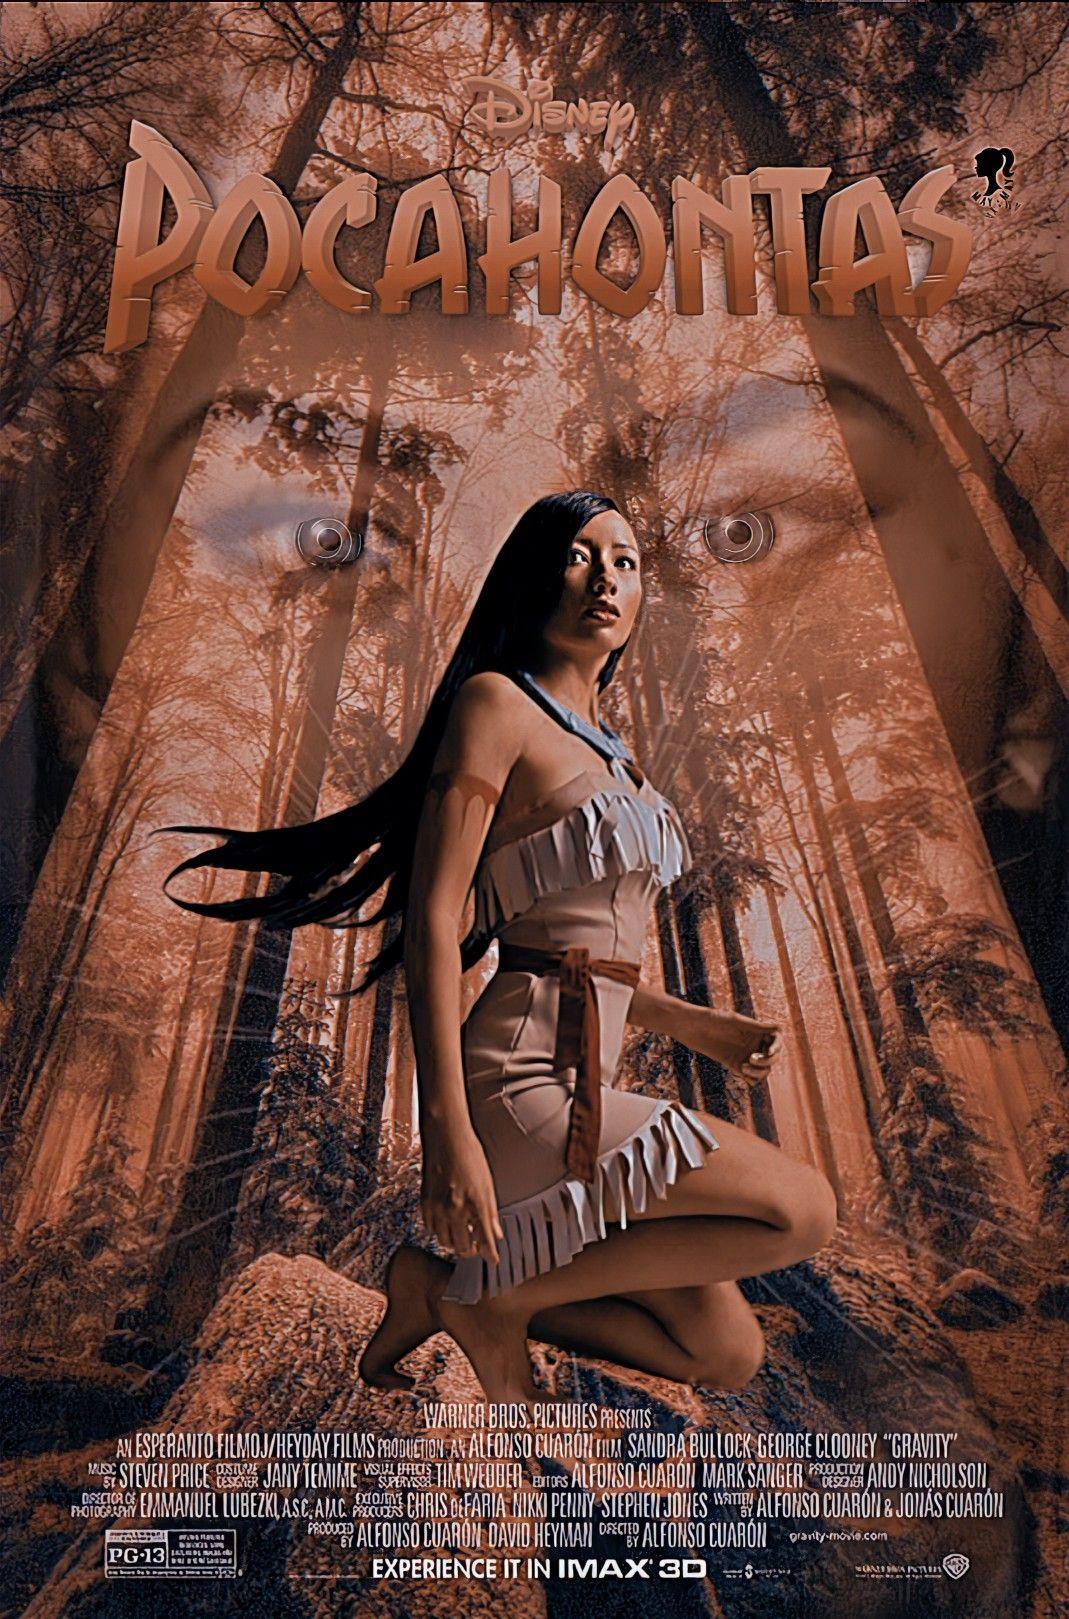 Pocahontas Live Action Poster Fã em 2020 Live action